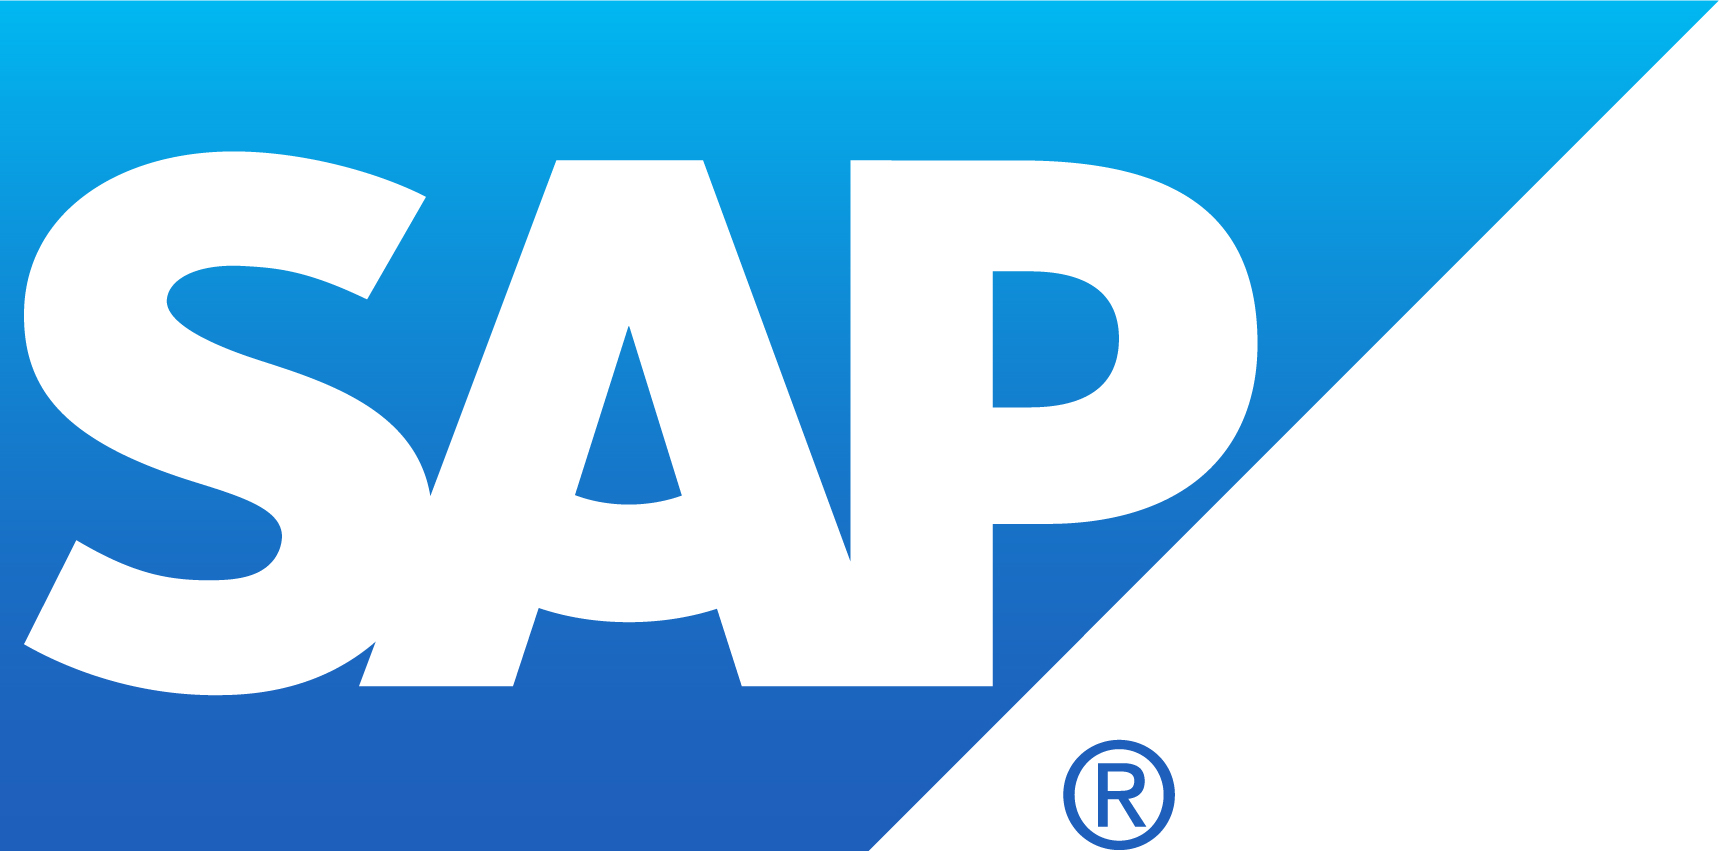 SAP_R_grad-1